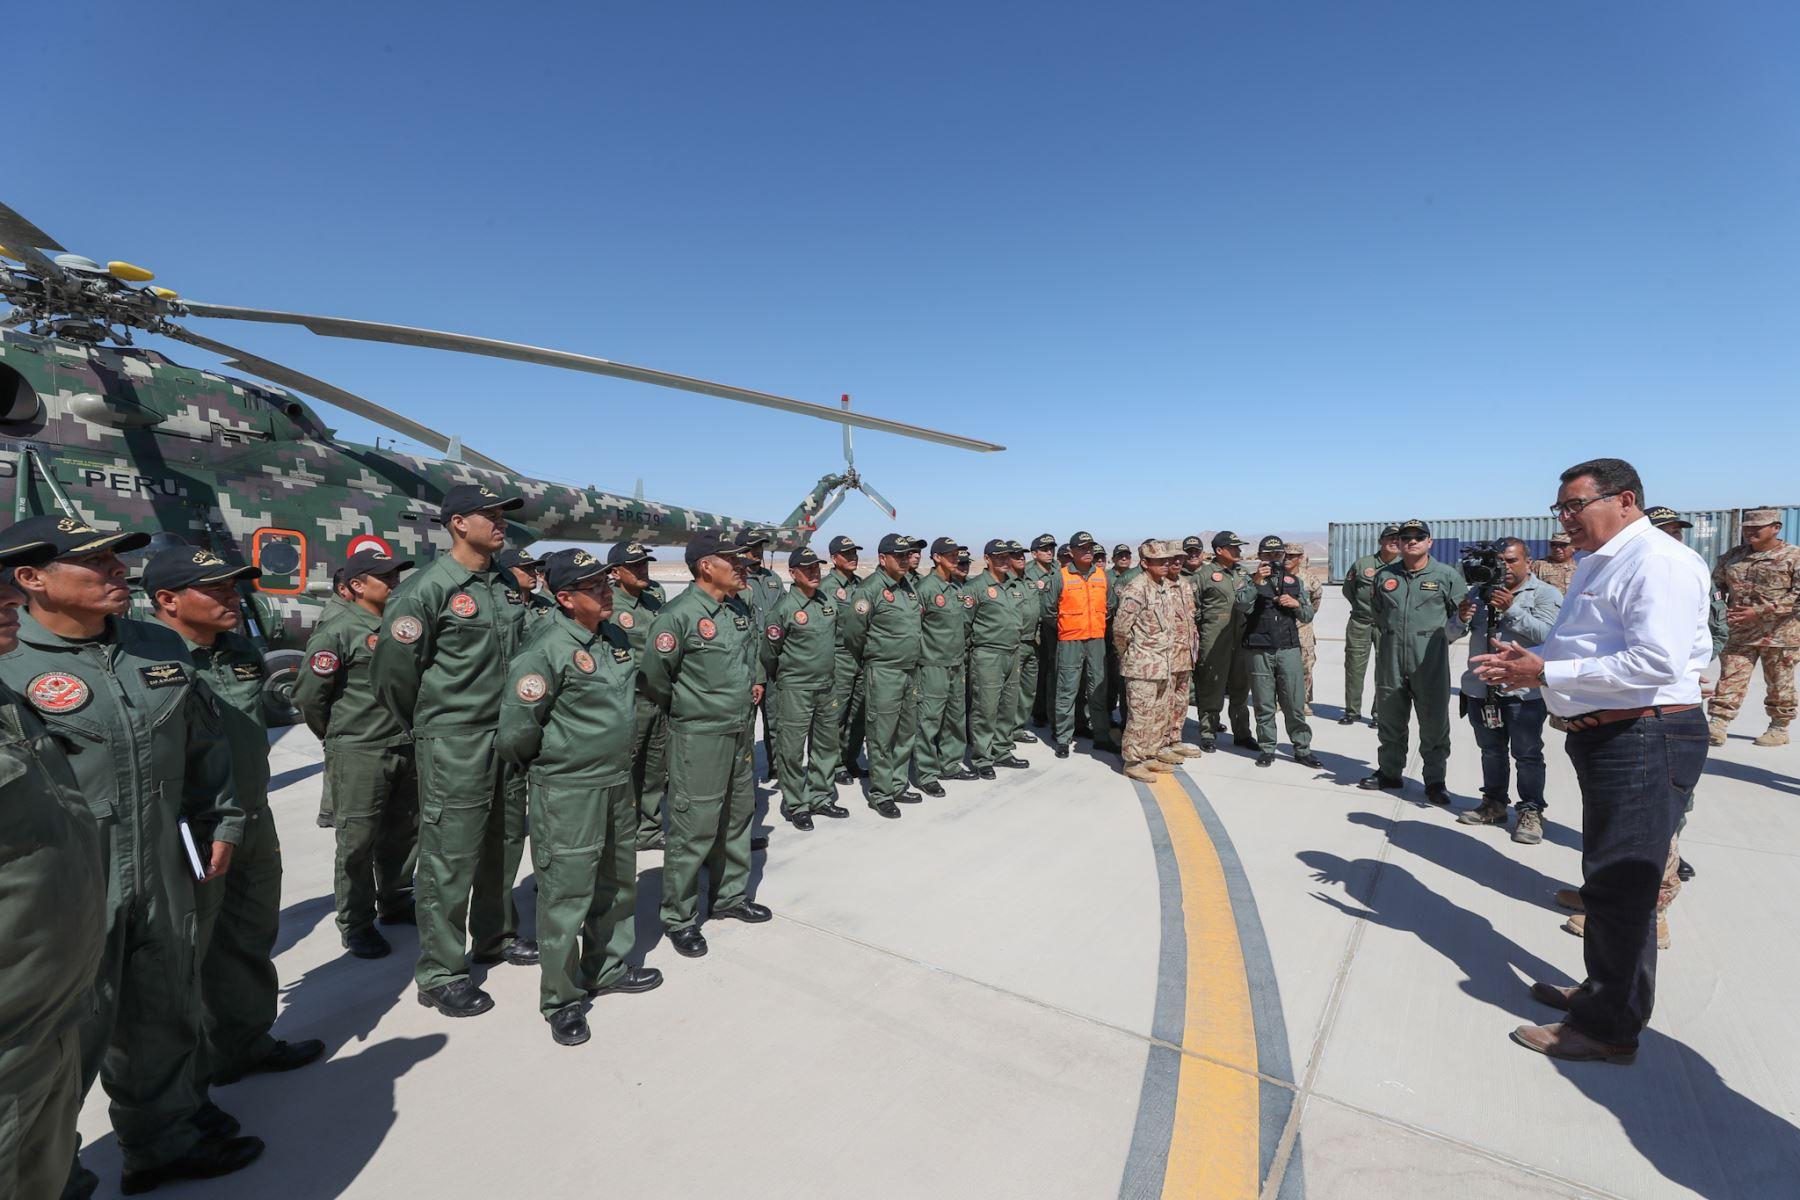 Ministro de Defensa, José Huerta visItó bases del Pedregal y Cemae en Arequipa. Foto: ANDINA/MINDEF